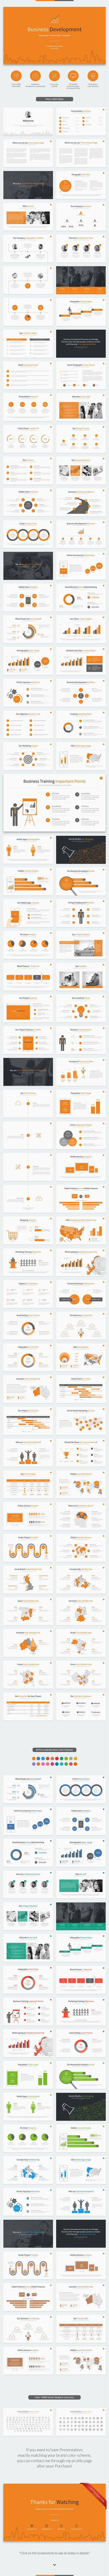 Business Development Google Slides Template - Business Developmen - Simple - Infographic - Google Slides - PowerPoint - Presentation - Diagrams - Graphs